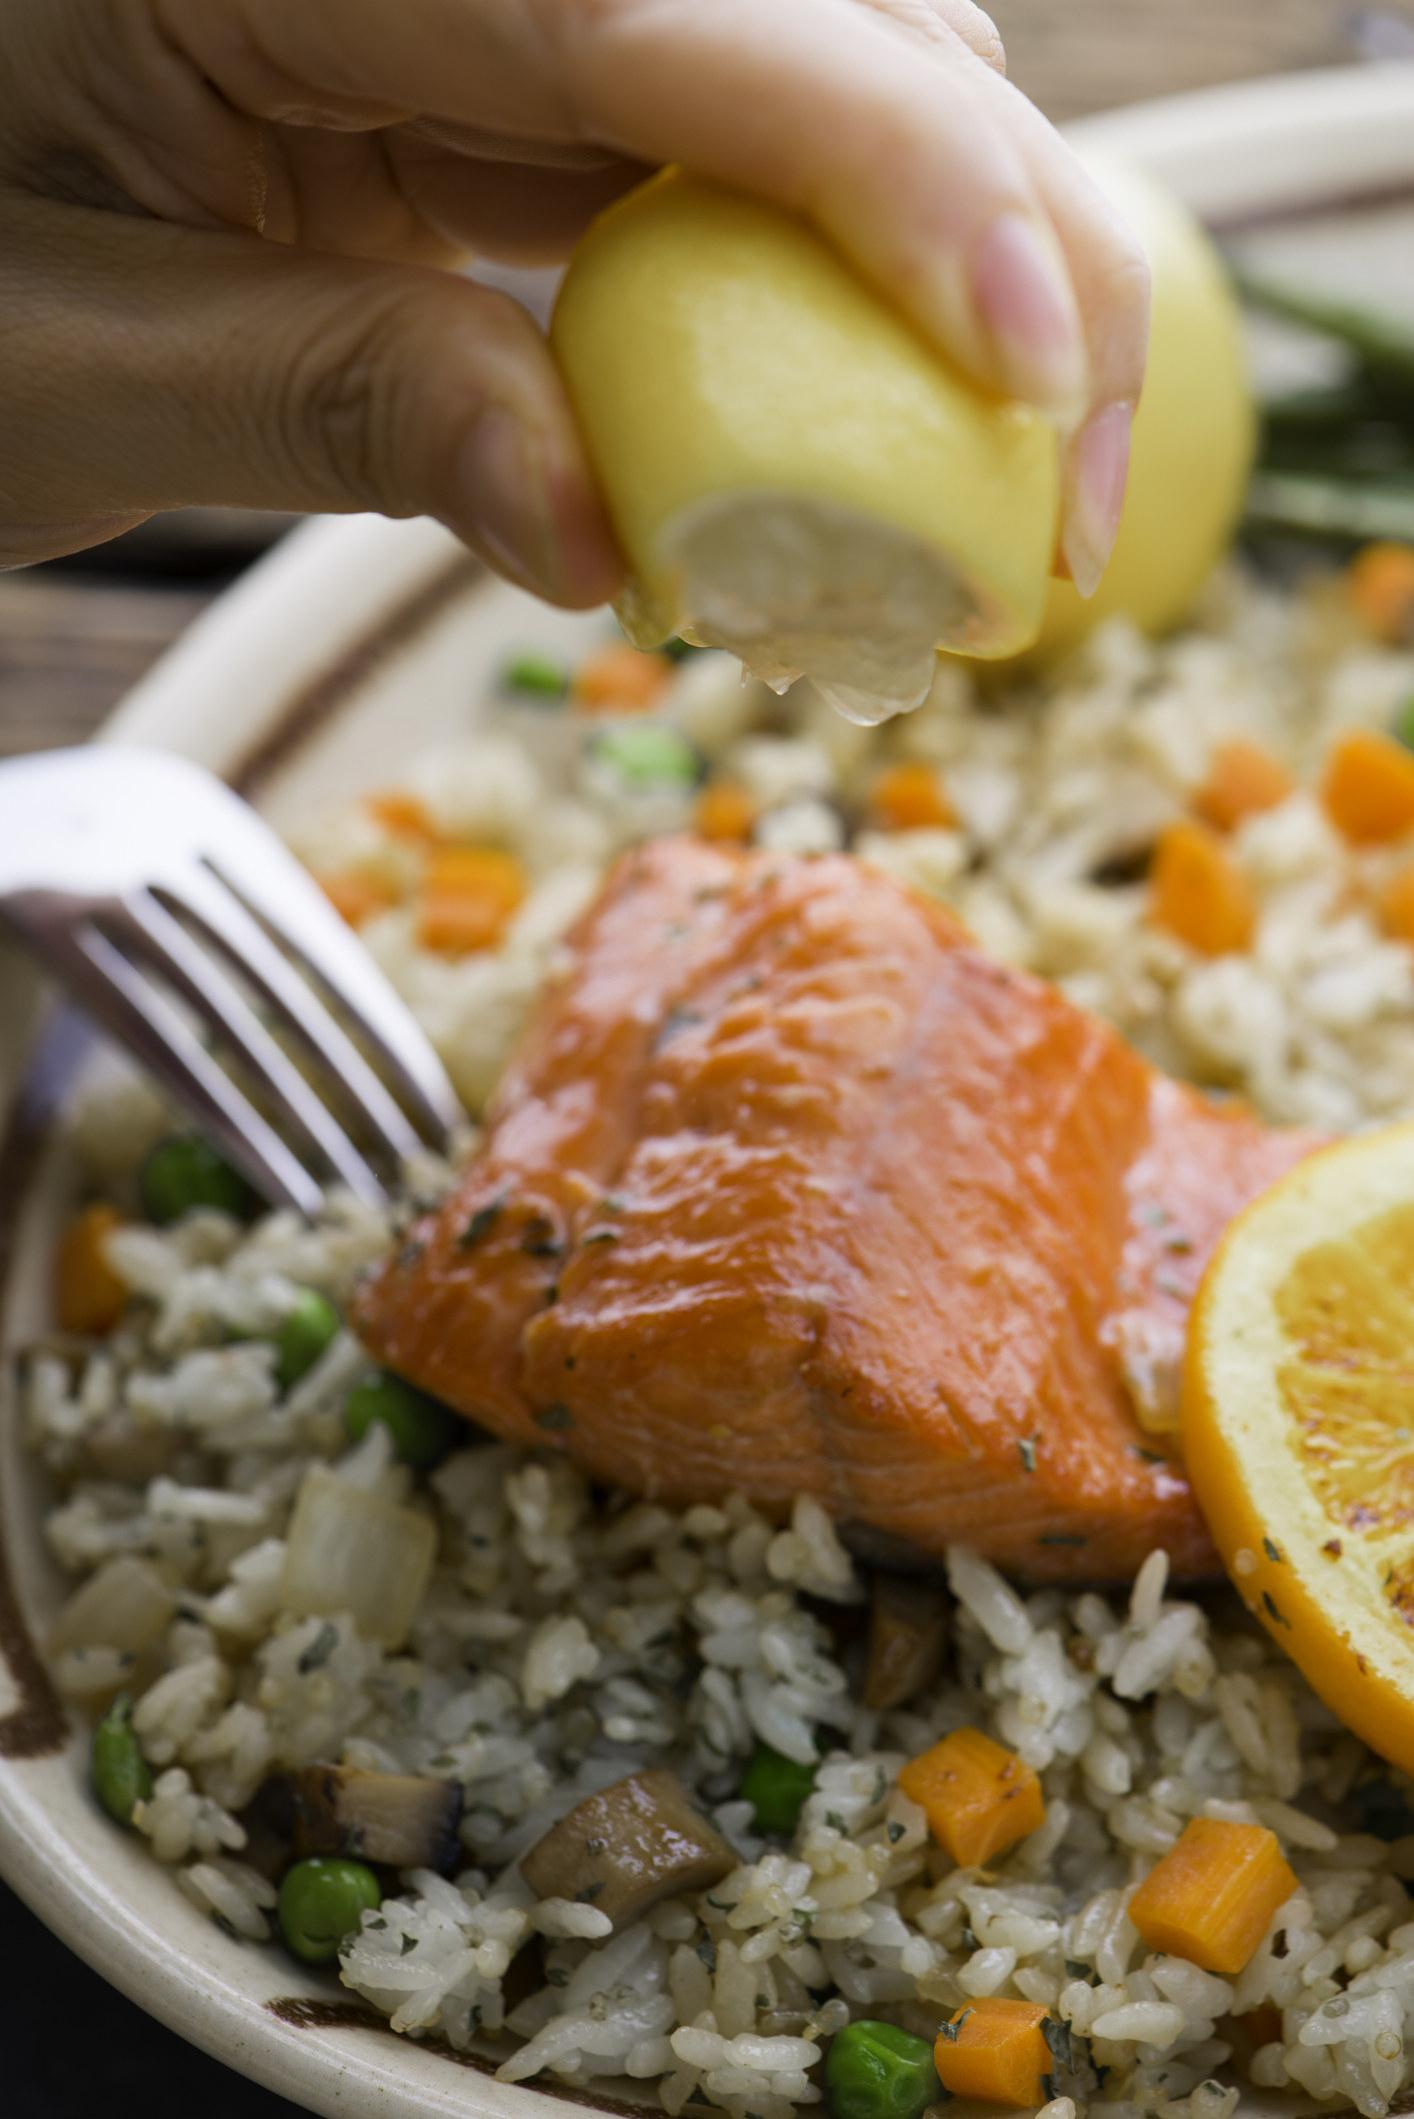 Squeezing lemon onto a piece of salmon